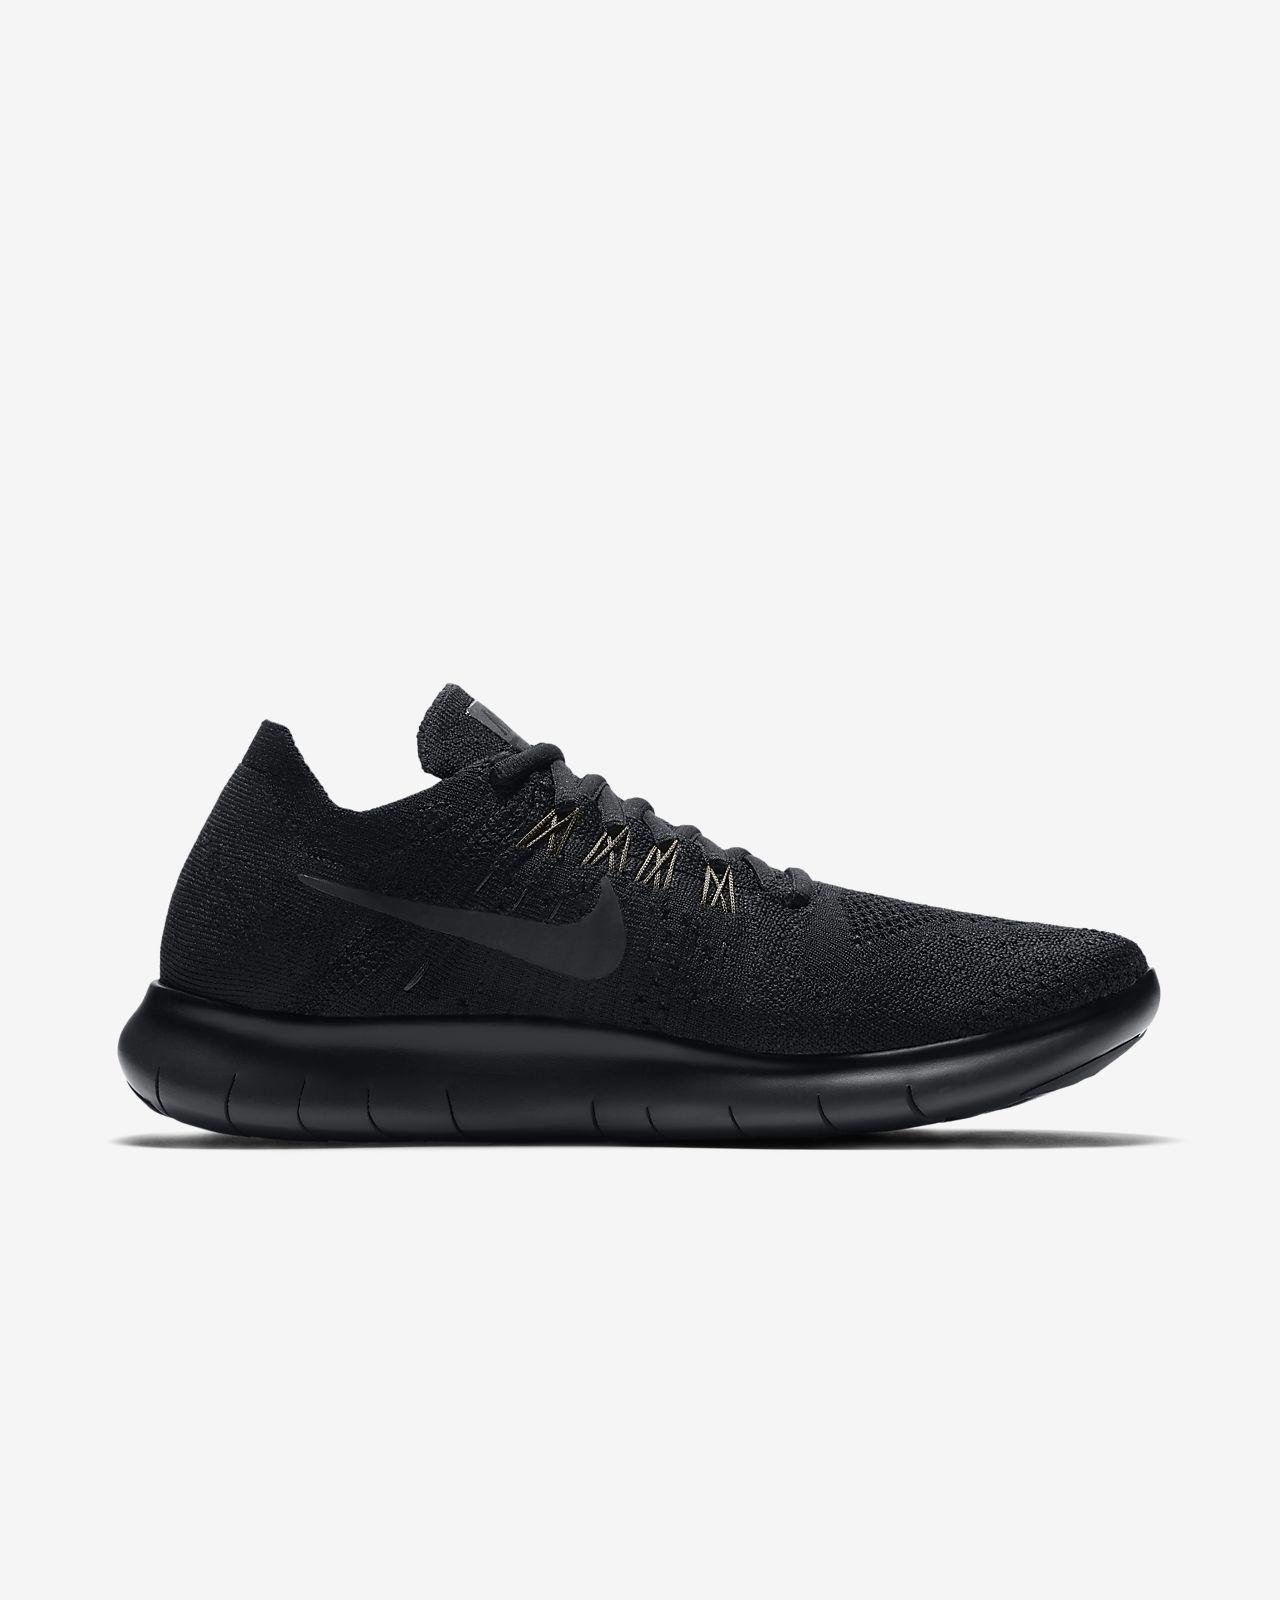 Acheter Nike Free Runs Après Nz